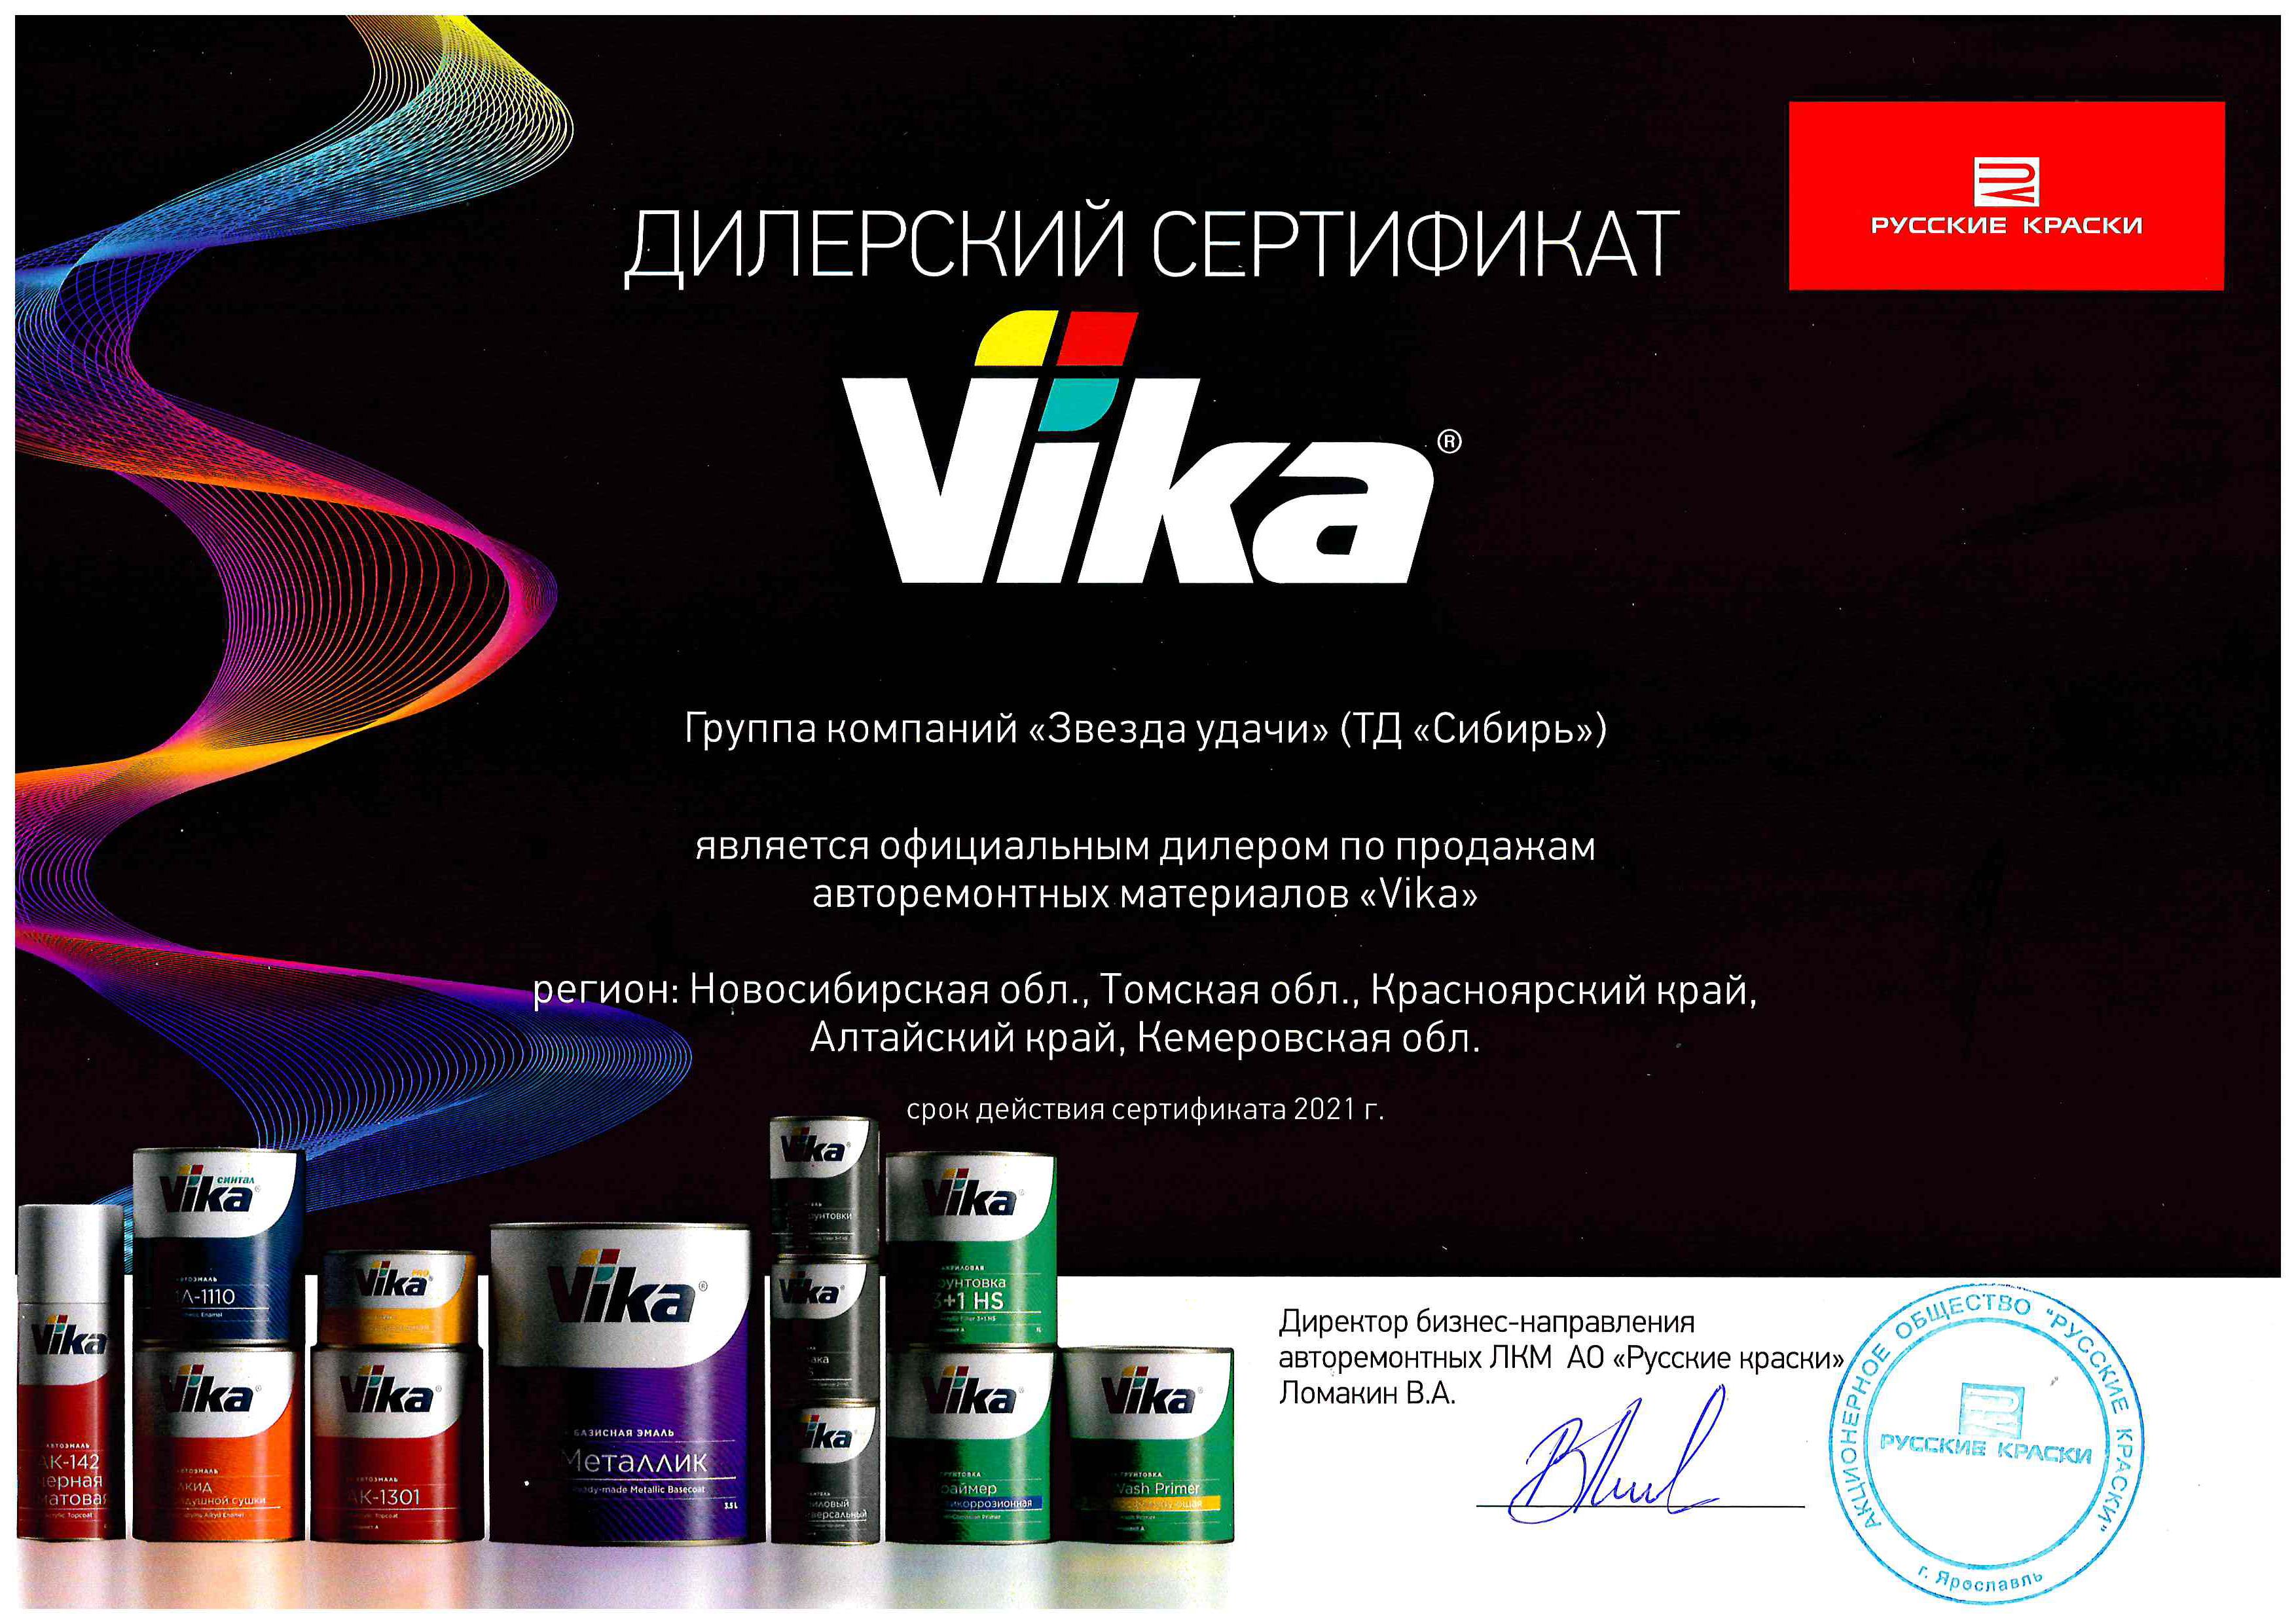 Сертификат дилера Vika